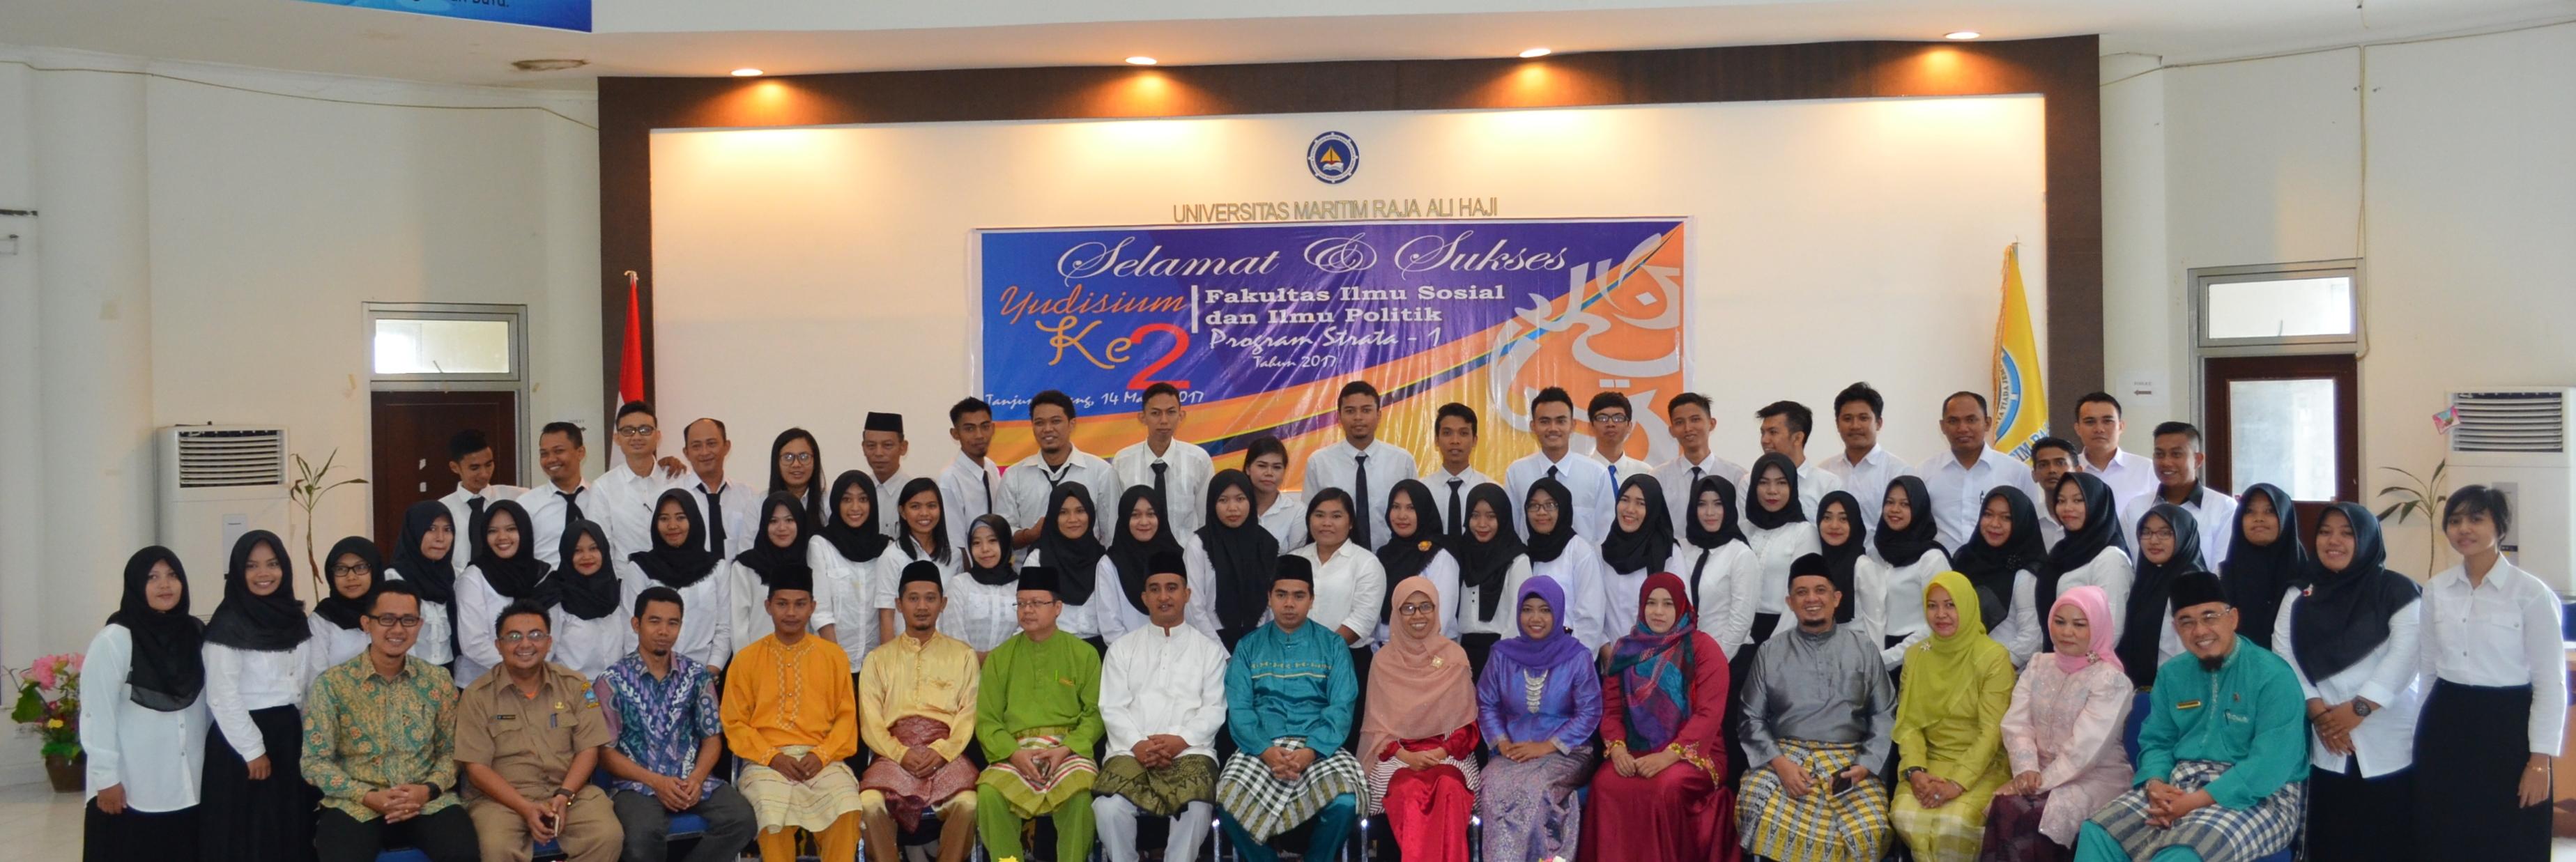 Yudisium Sarjana ke-2 Fakultas Ilmu Sosial dan Ilmu Politik UMRAH